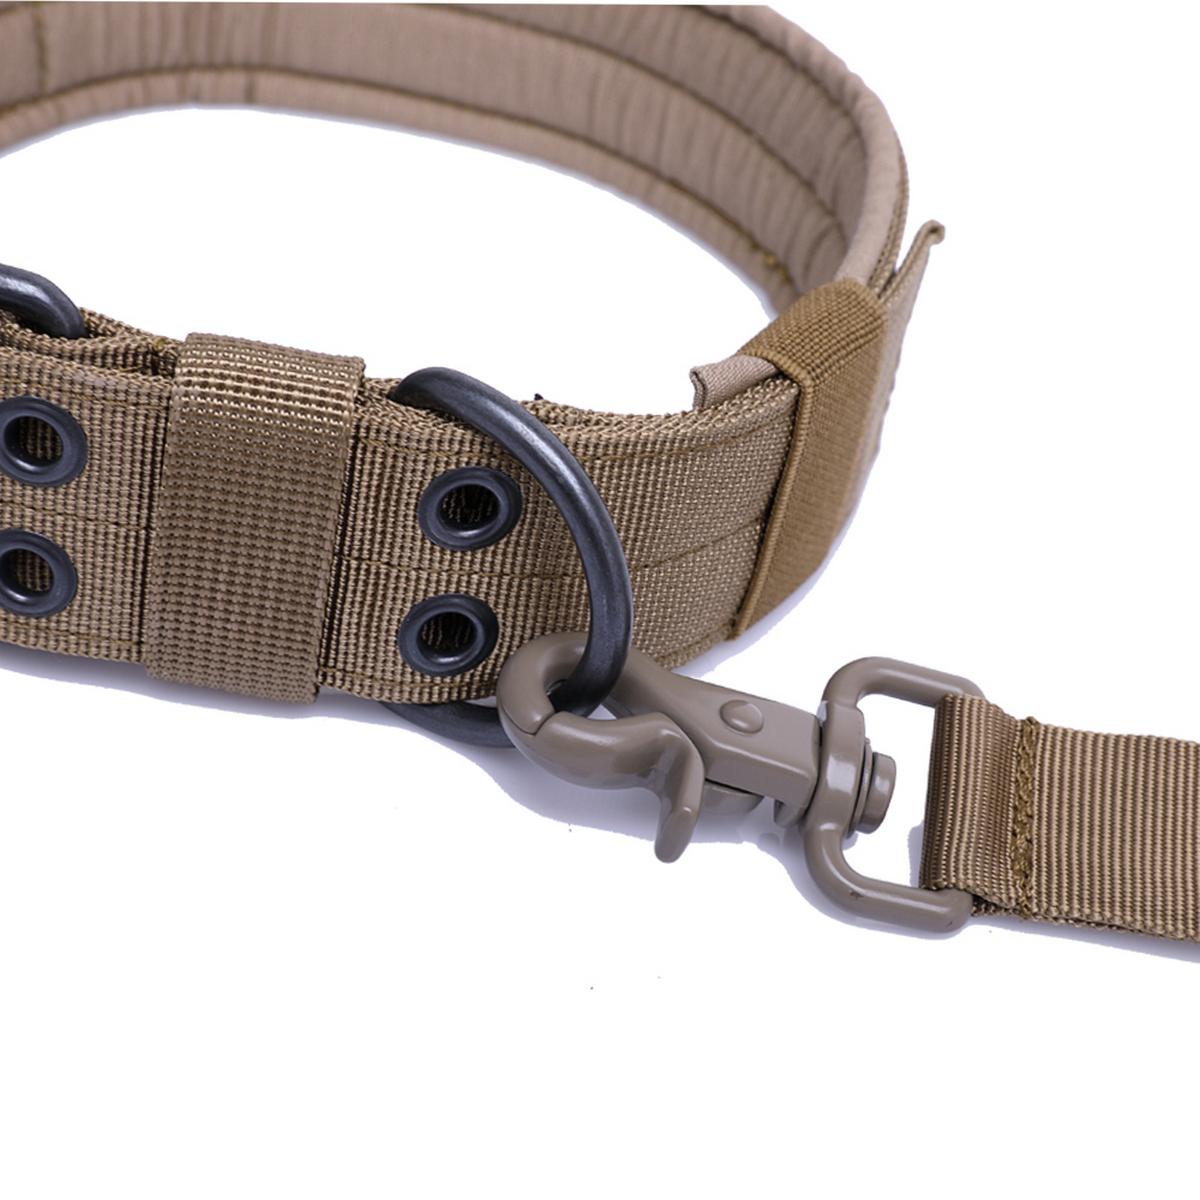 Tactical-Scorpion-Gear-Dog-Collar-Canine-K9-Training-Walking-Military-Nylon thumbnail 12